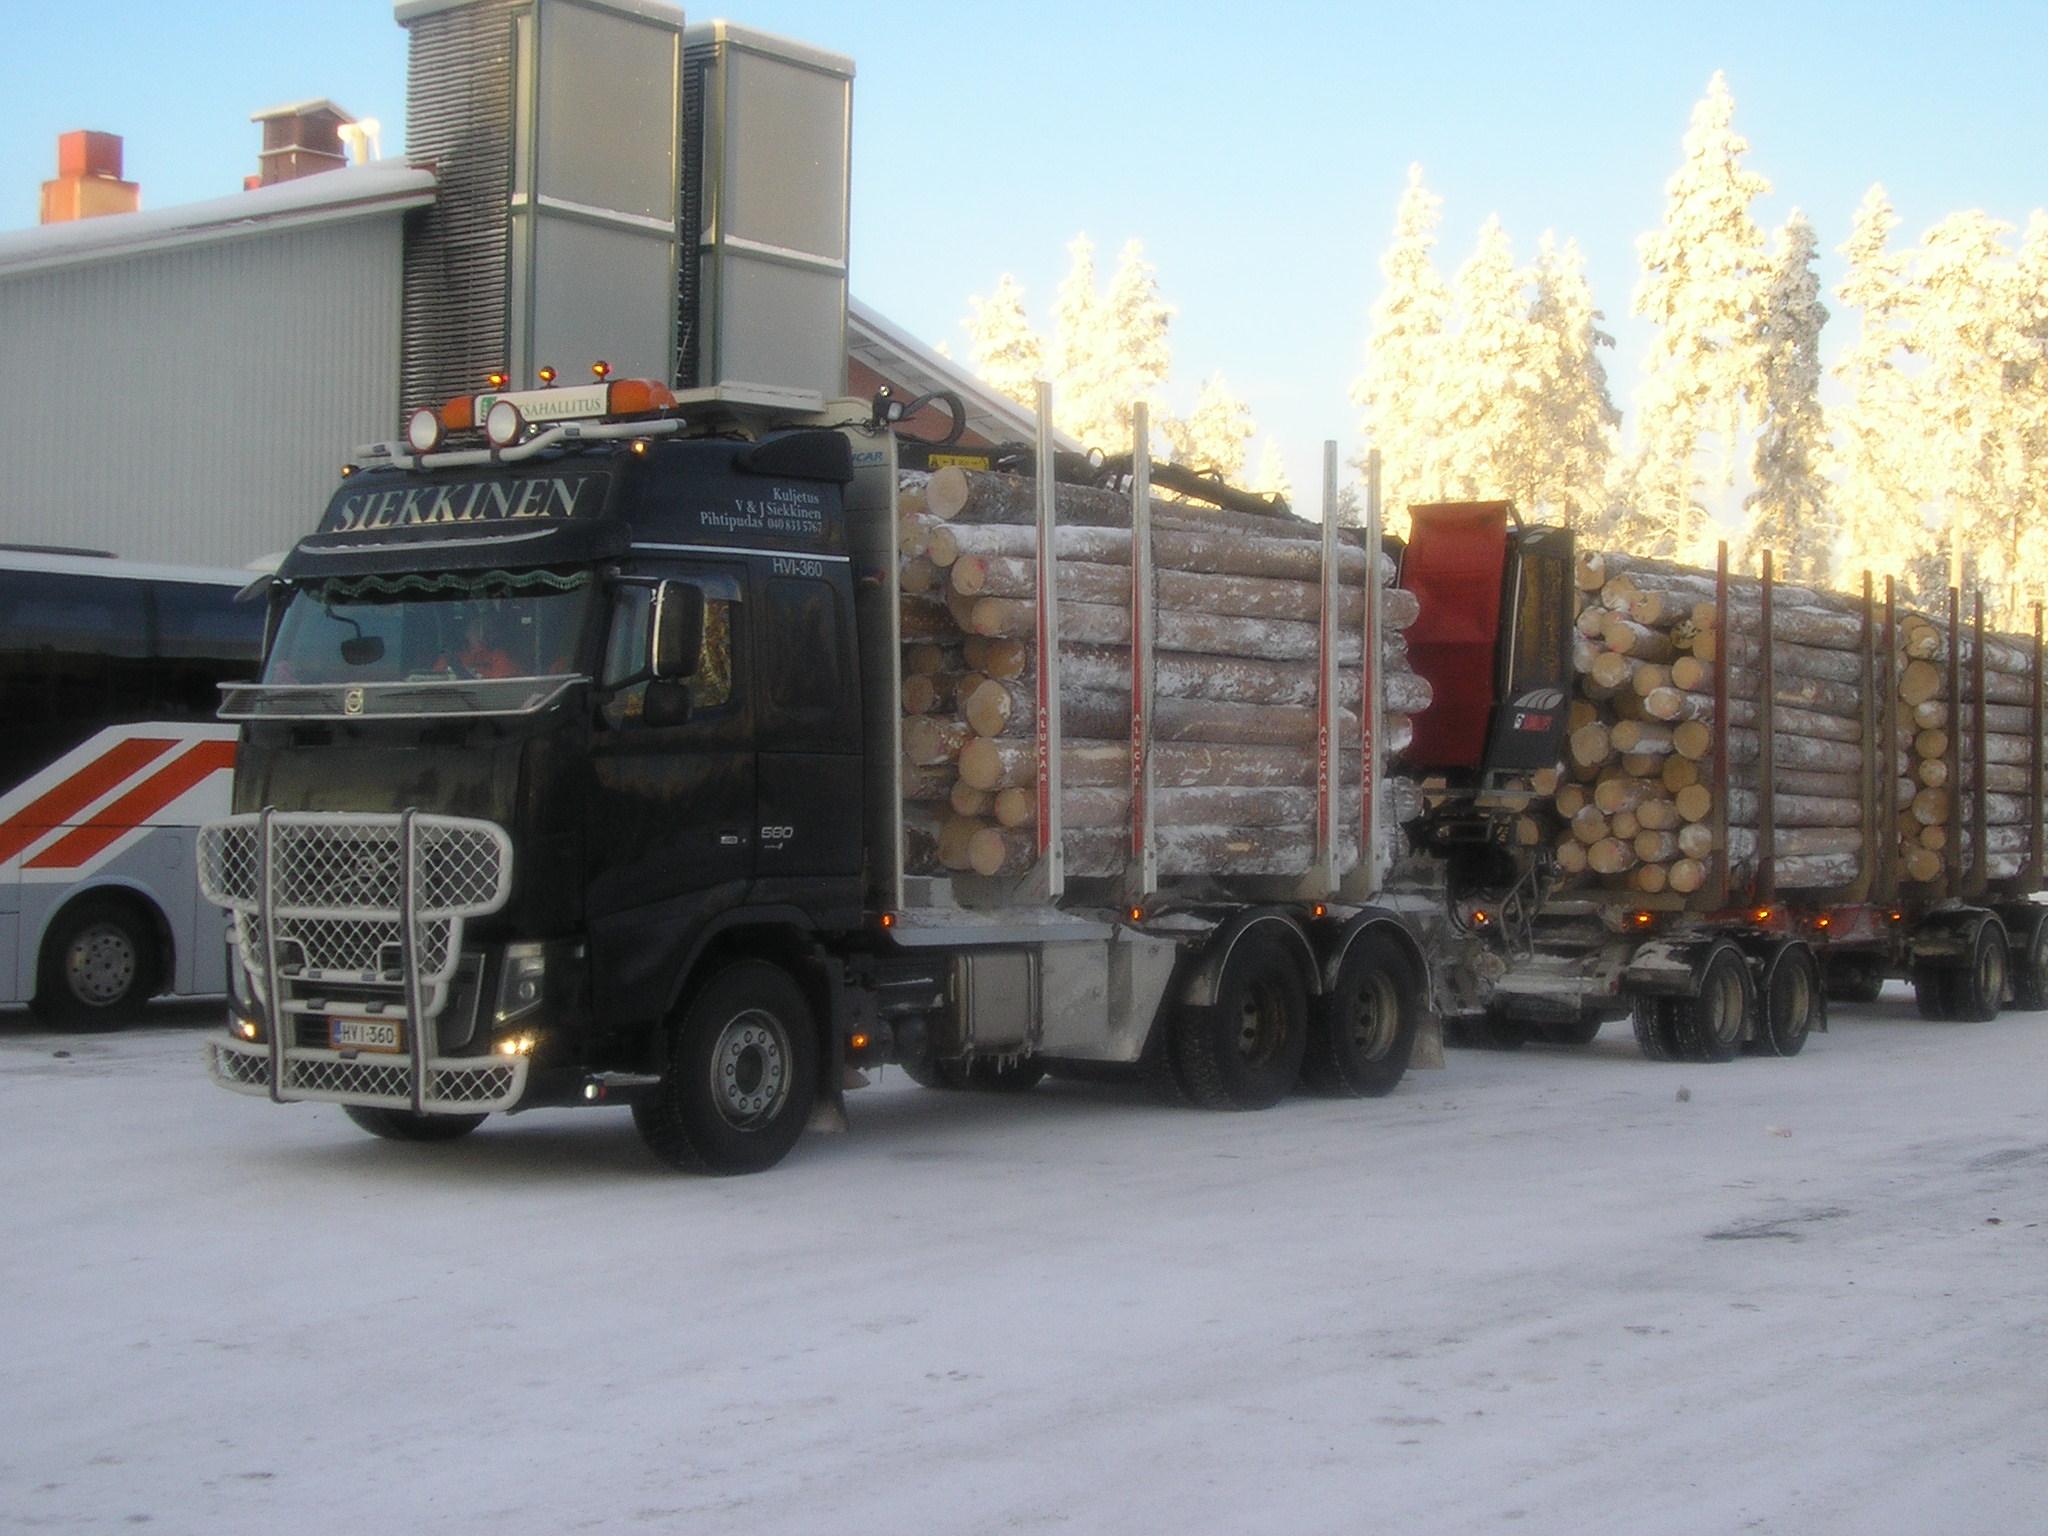 W & W Lumber: Home